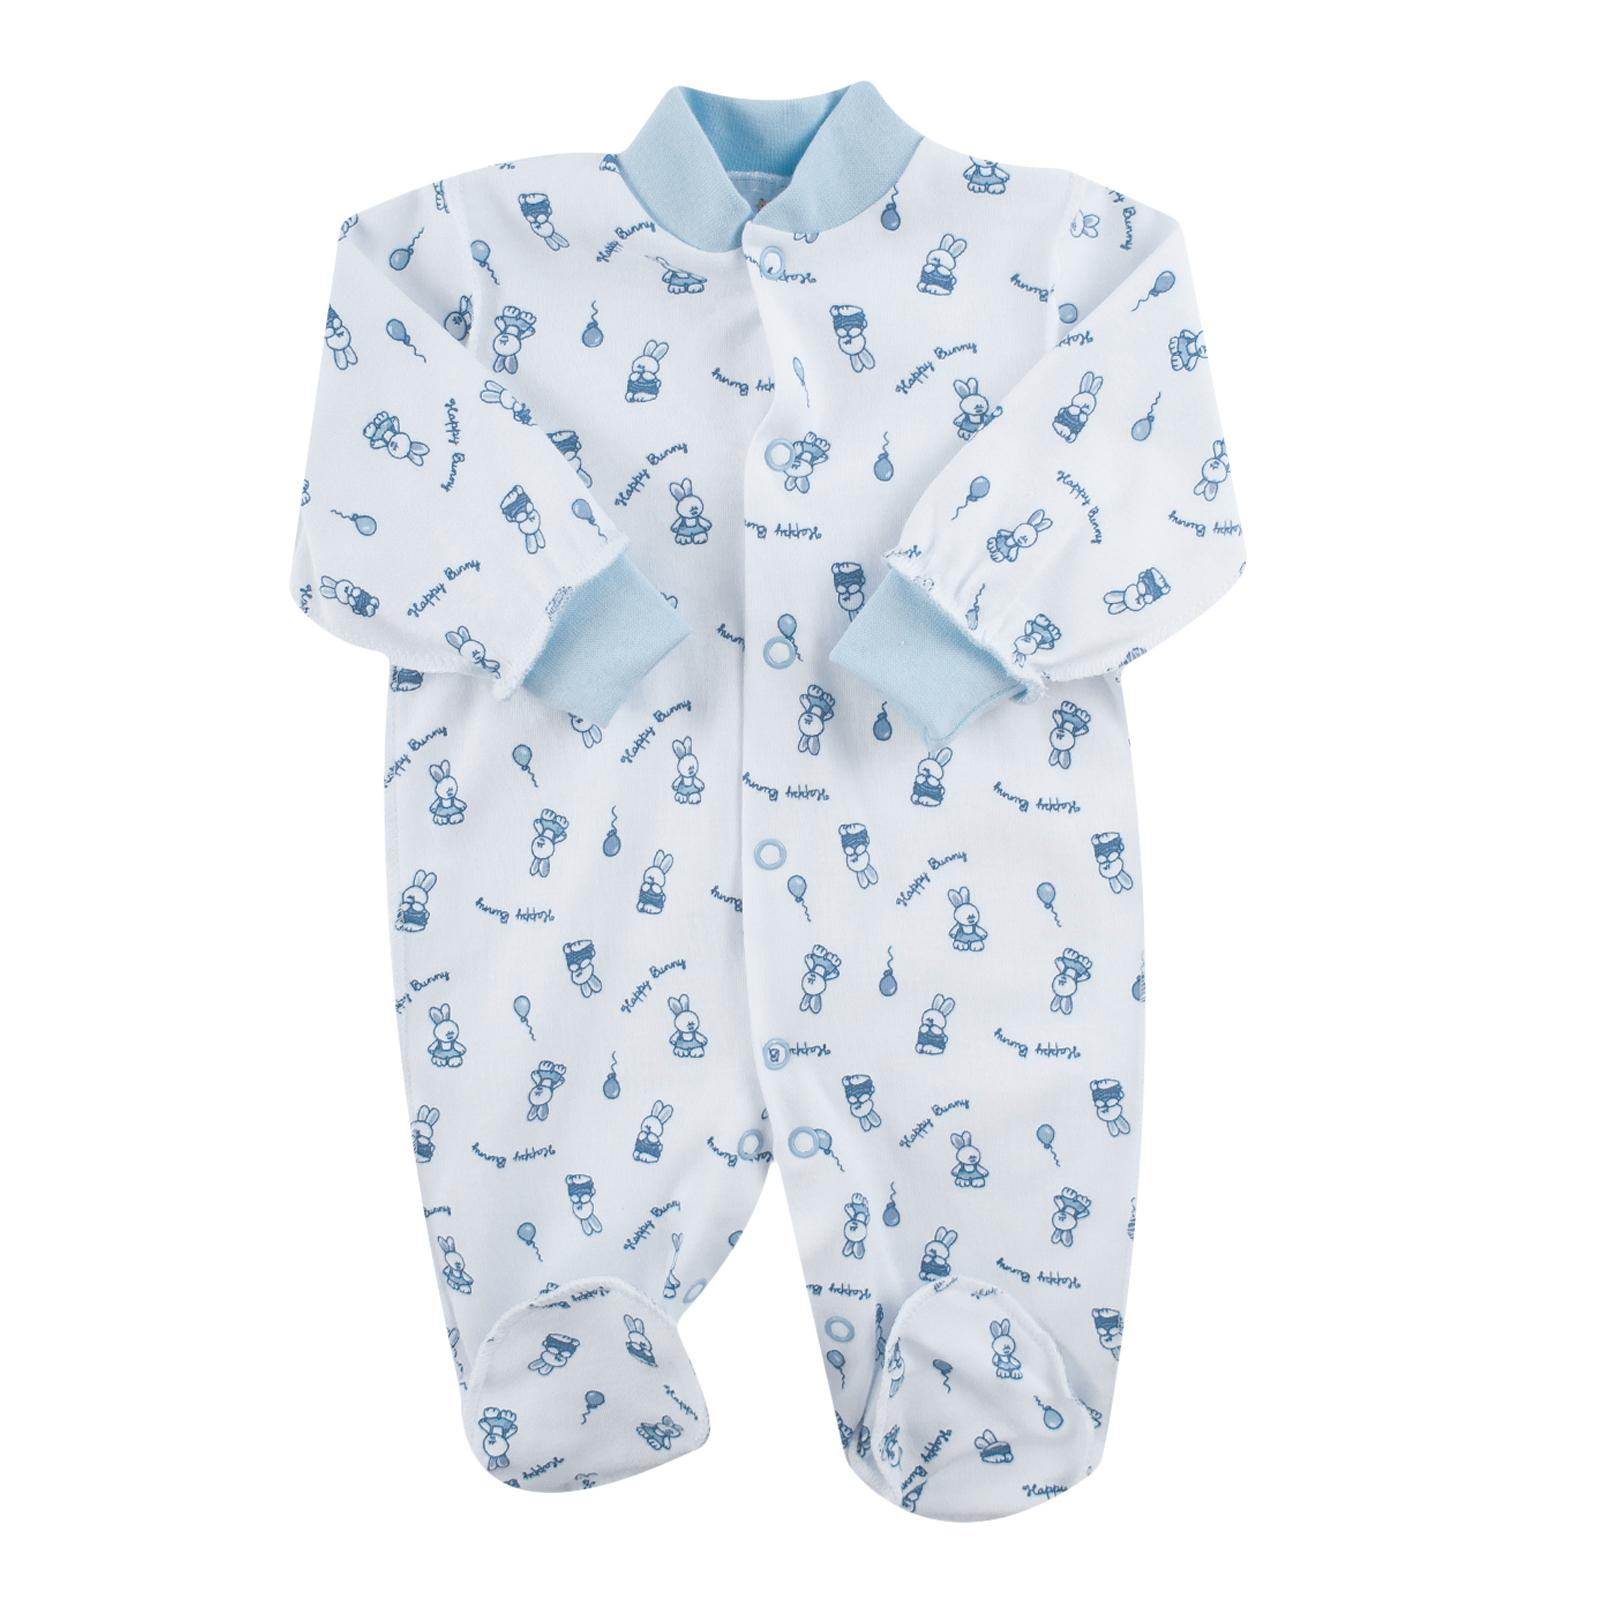 Комбинезон КОТМАРКОТ для мальчика, цвет набивка голубой тон 0-1 мес (размер 56)